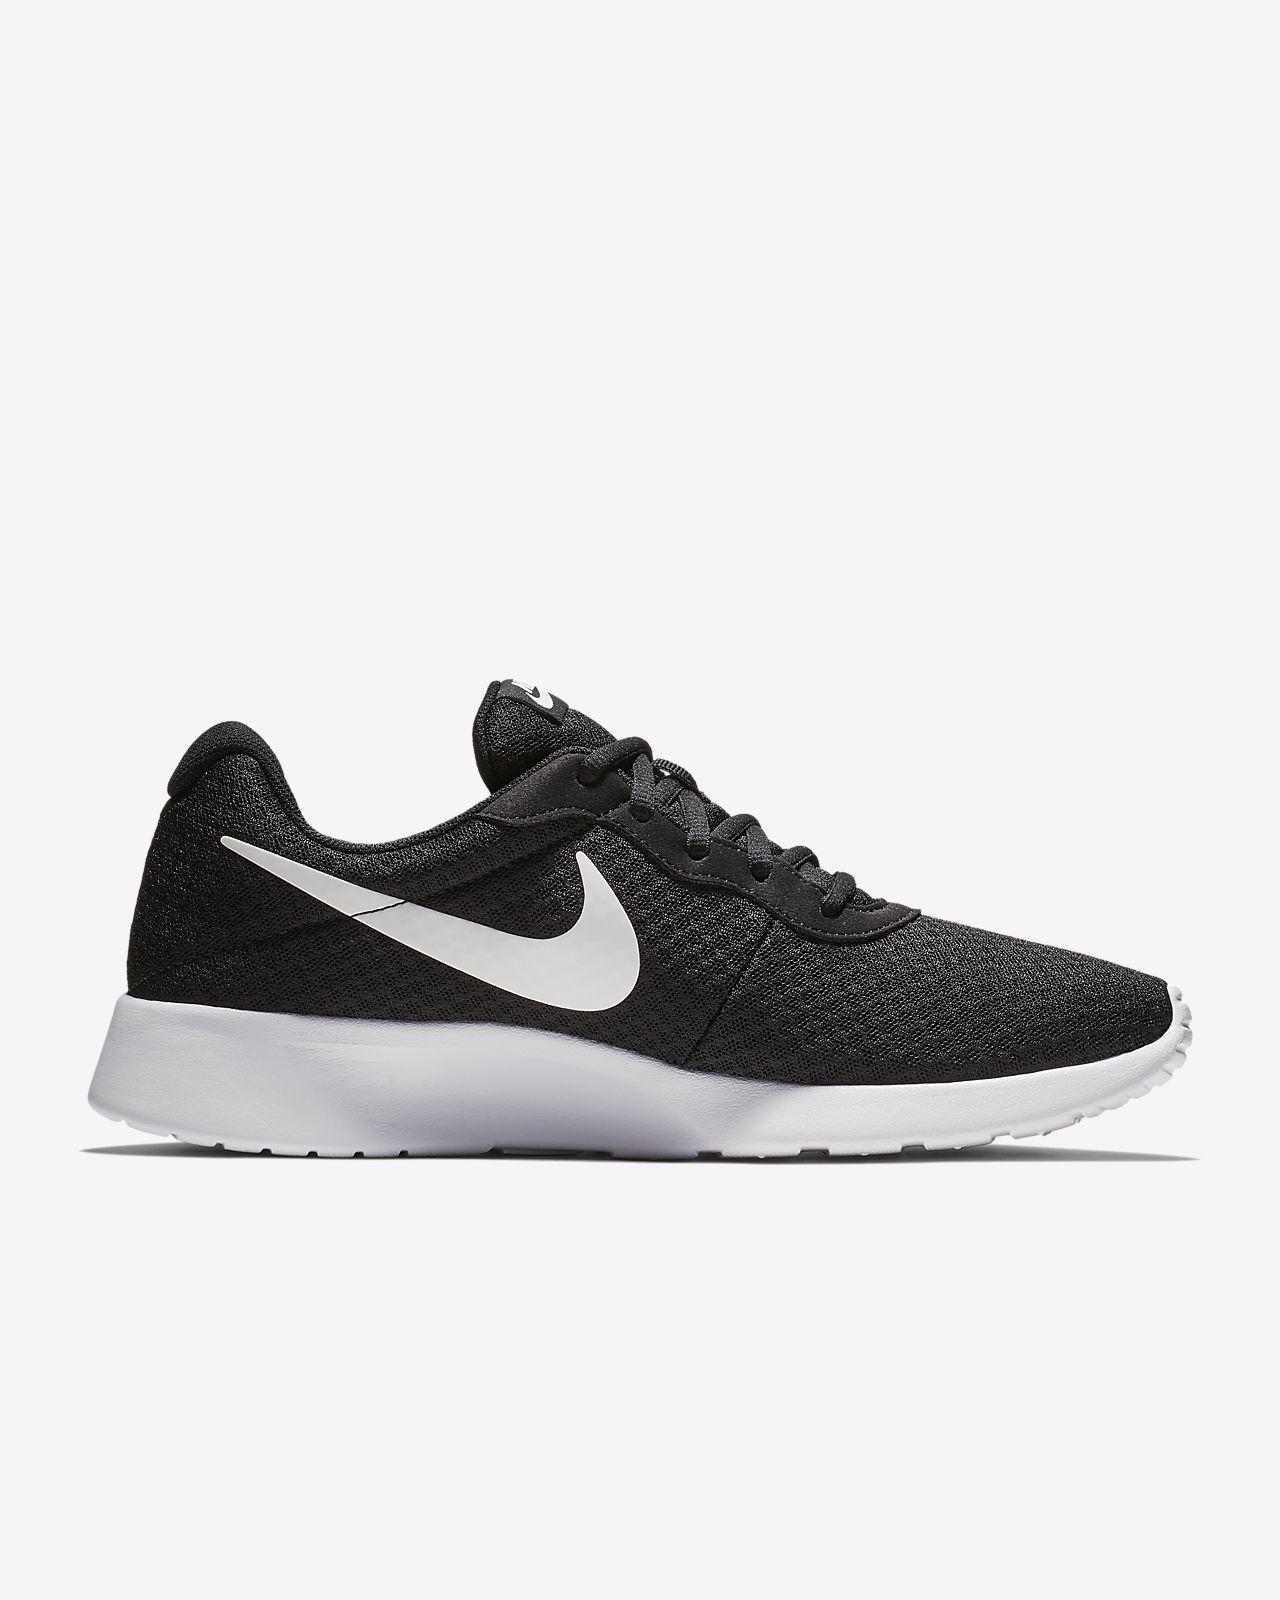 Tênis Feminino Nike 812655 011 Tanjun Preto branco